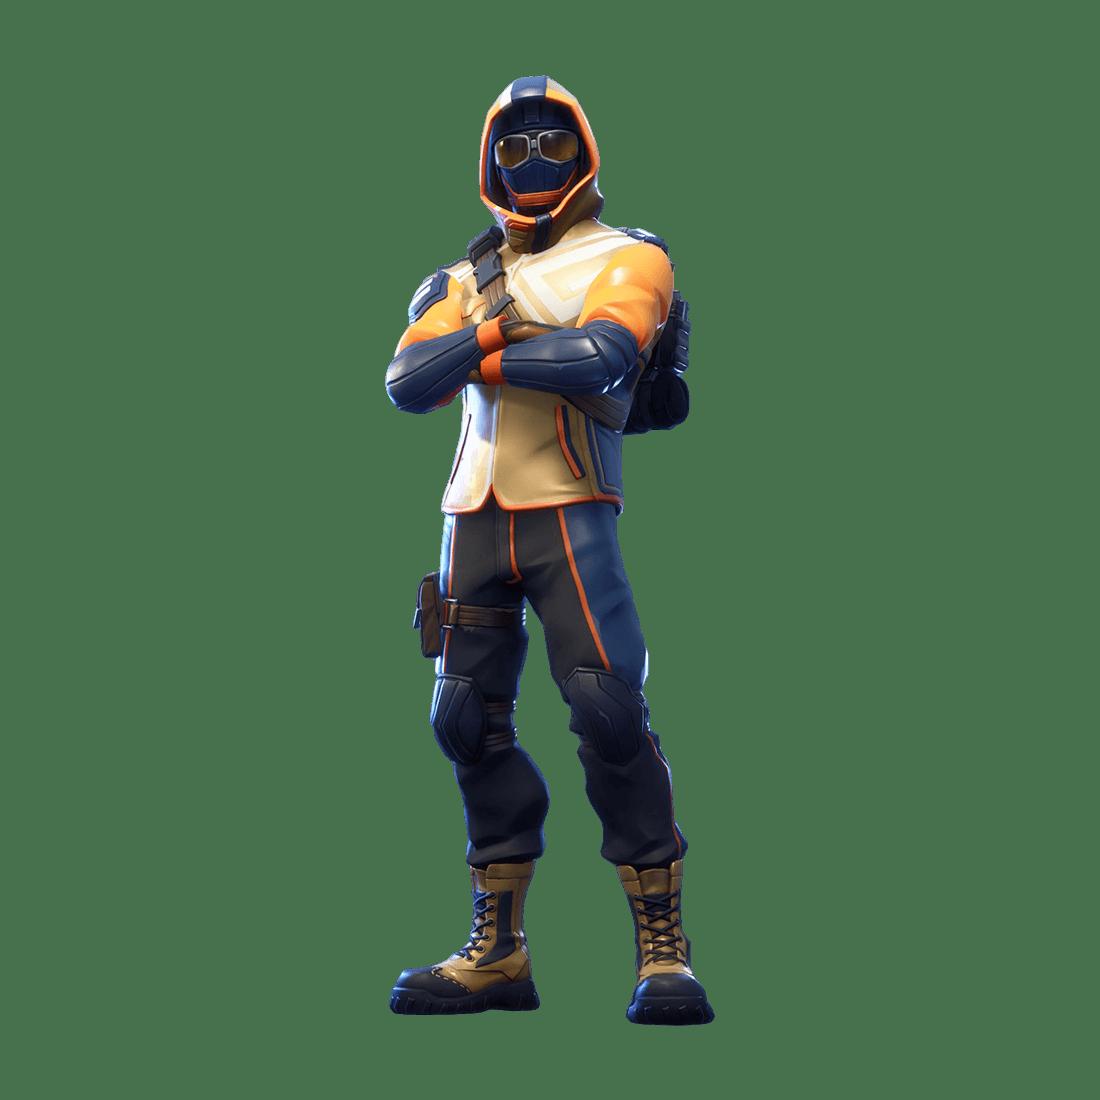 summit striker featured png featured - summit striker fortnite release date